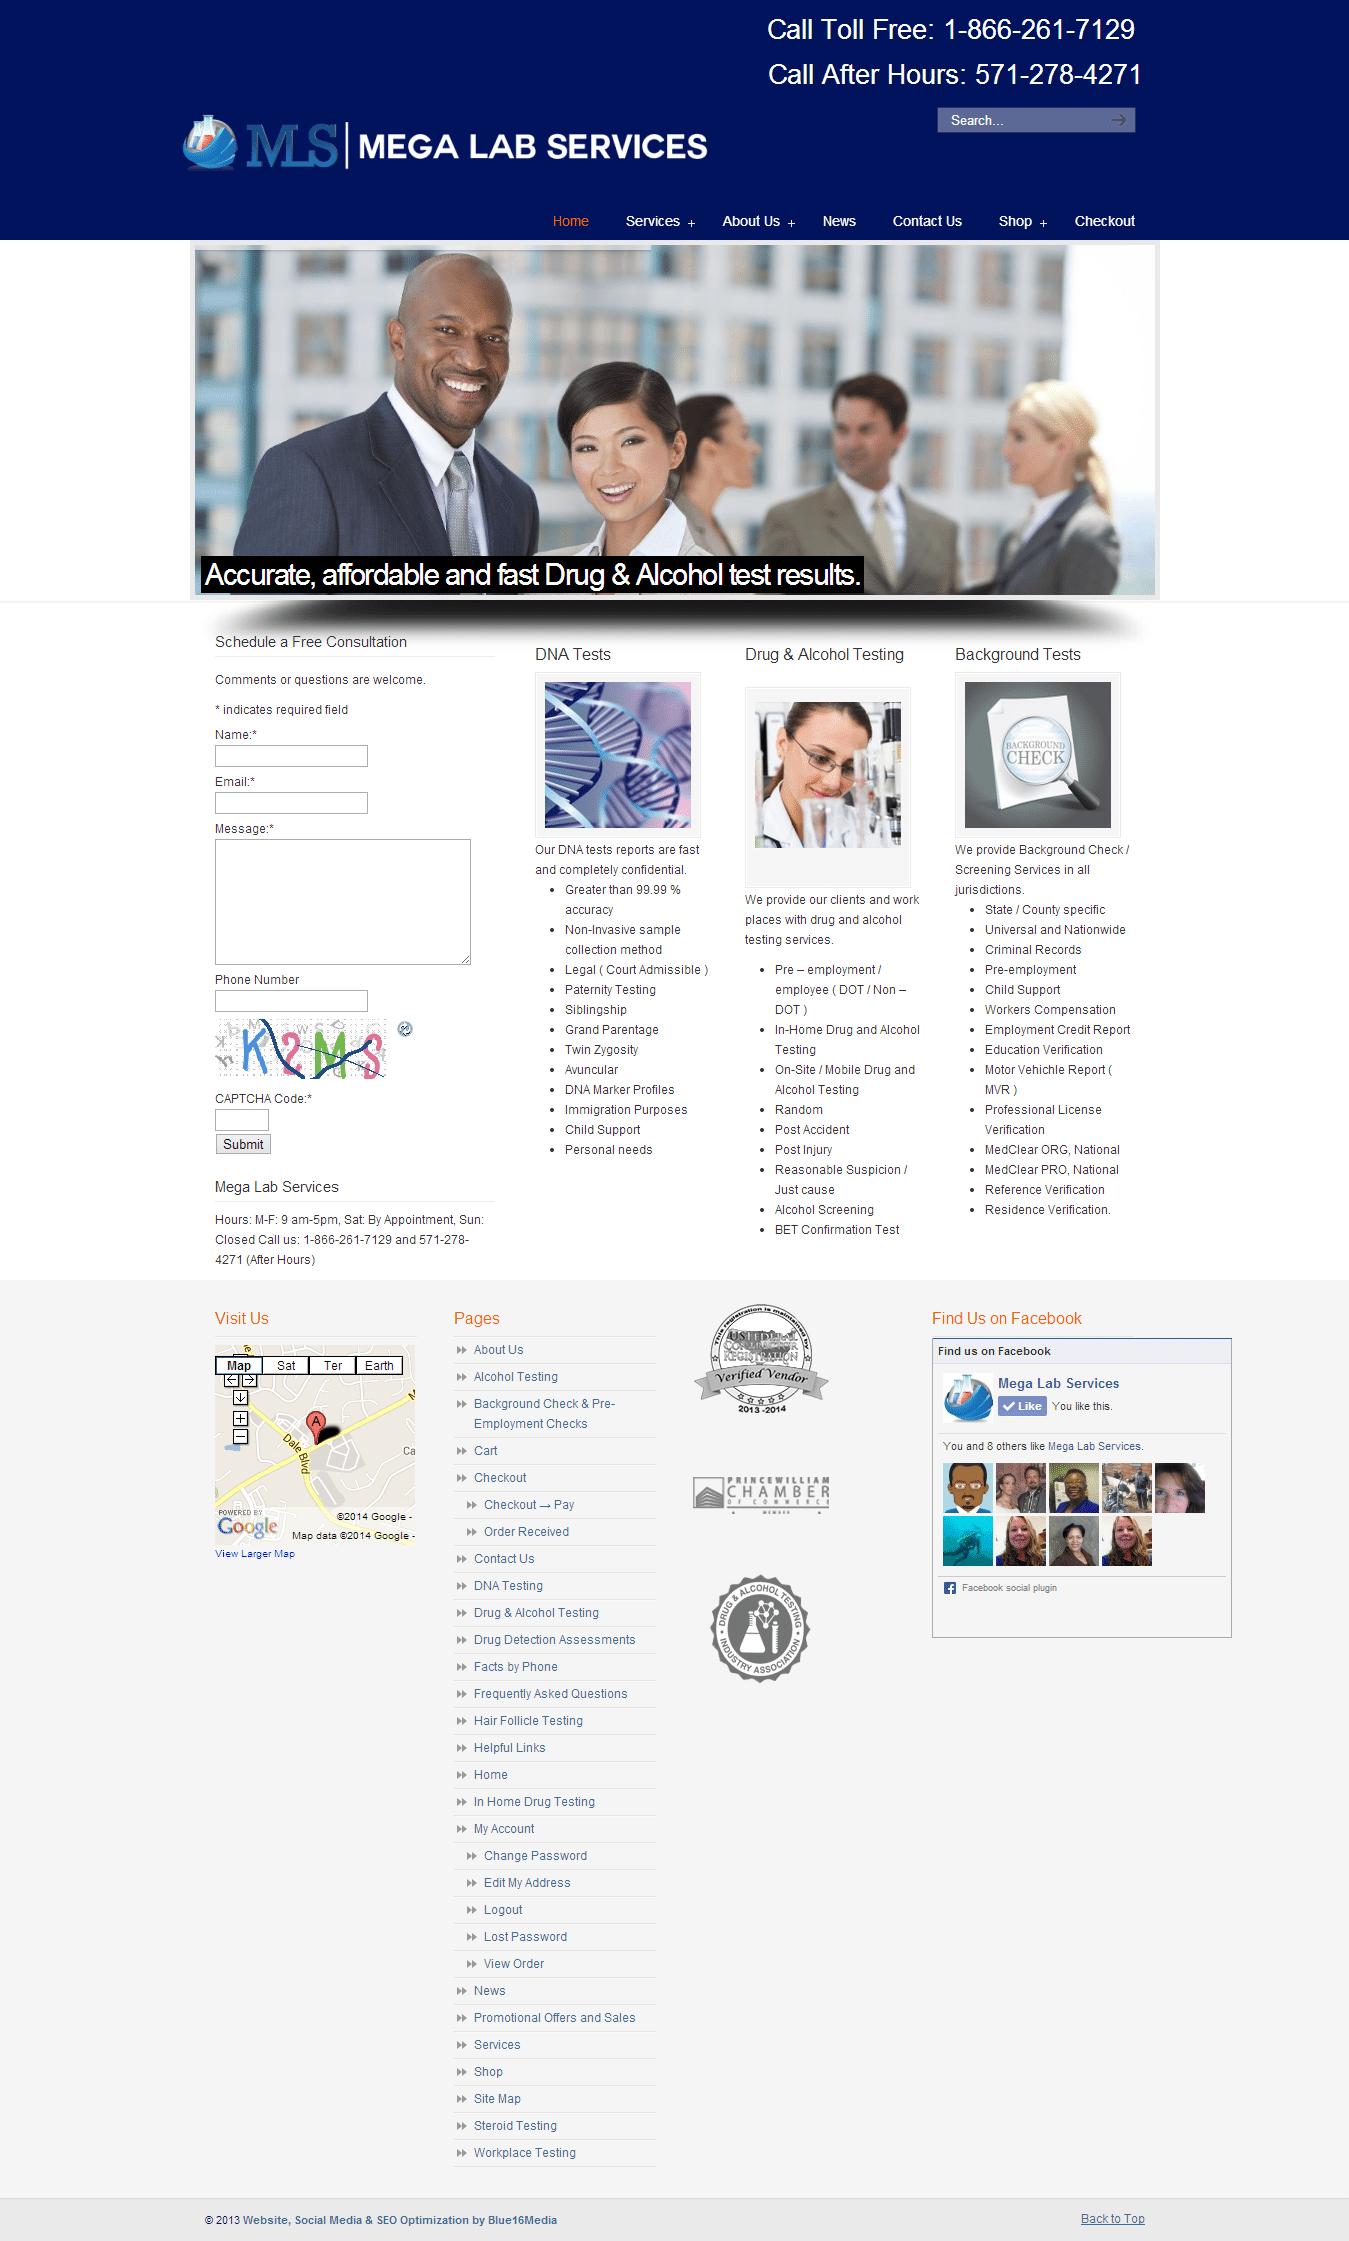 Mega Lab Services